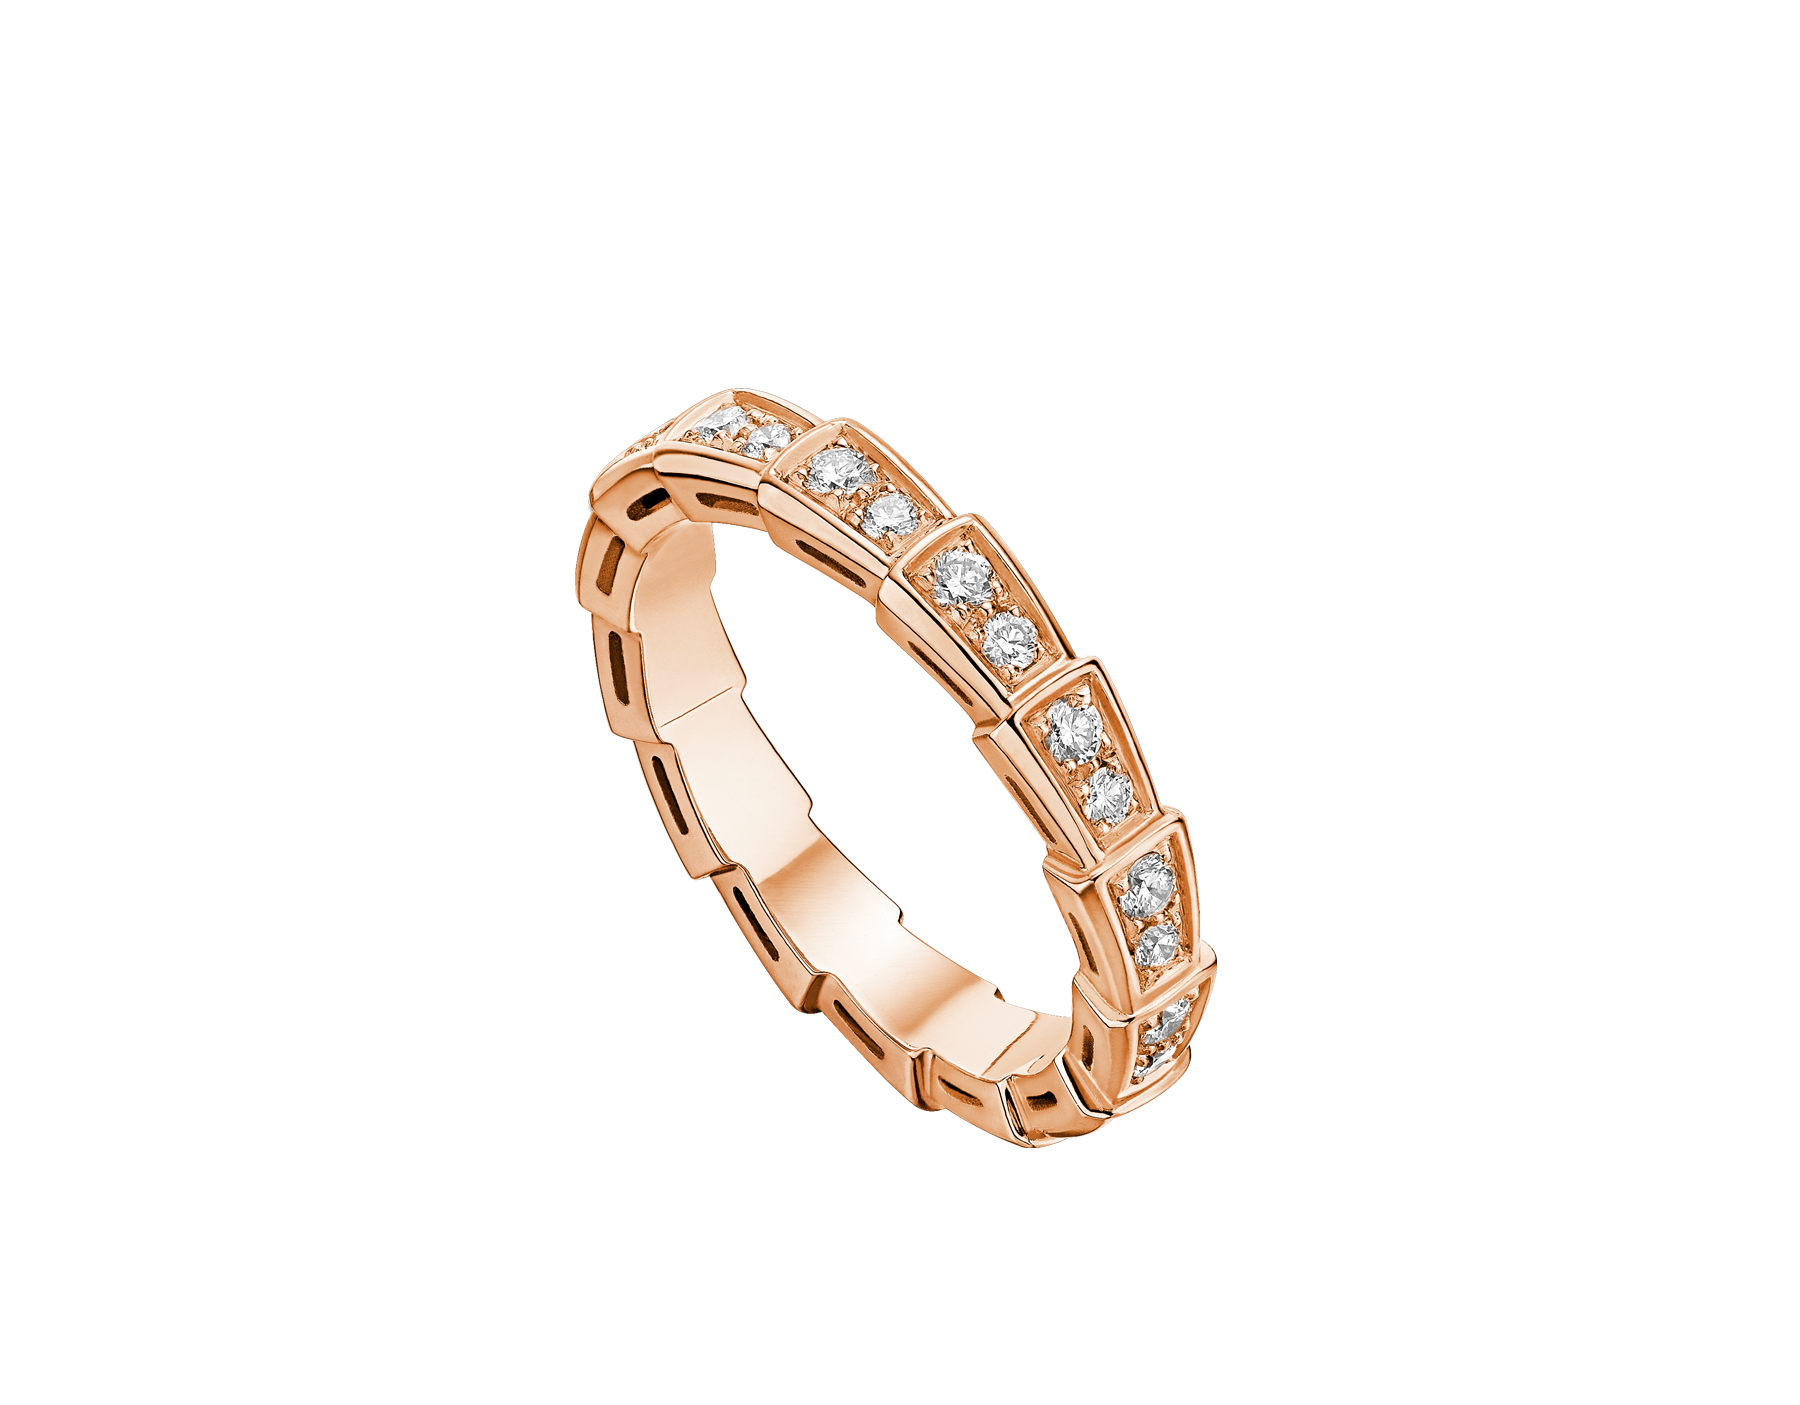 Serpenti Ring Wedding Rings For Women Wedding Rings Engagement